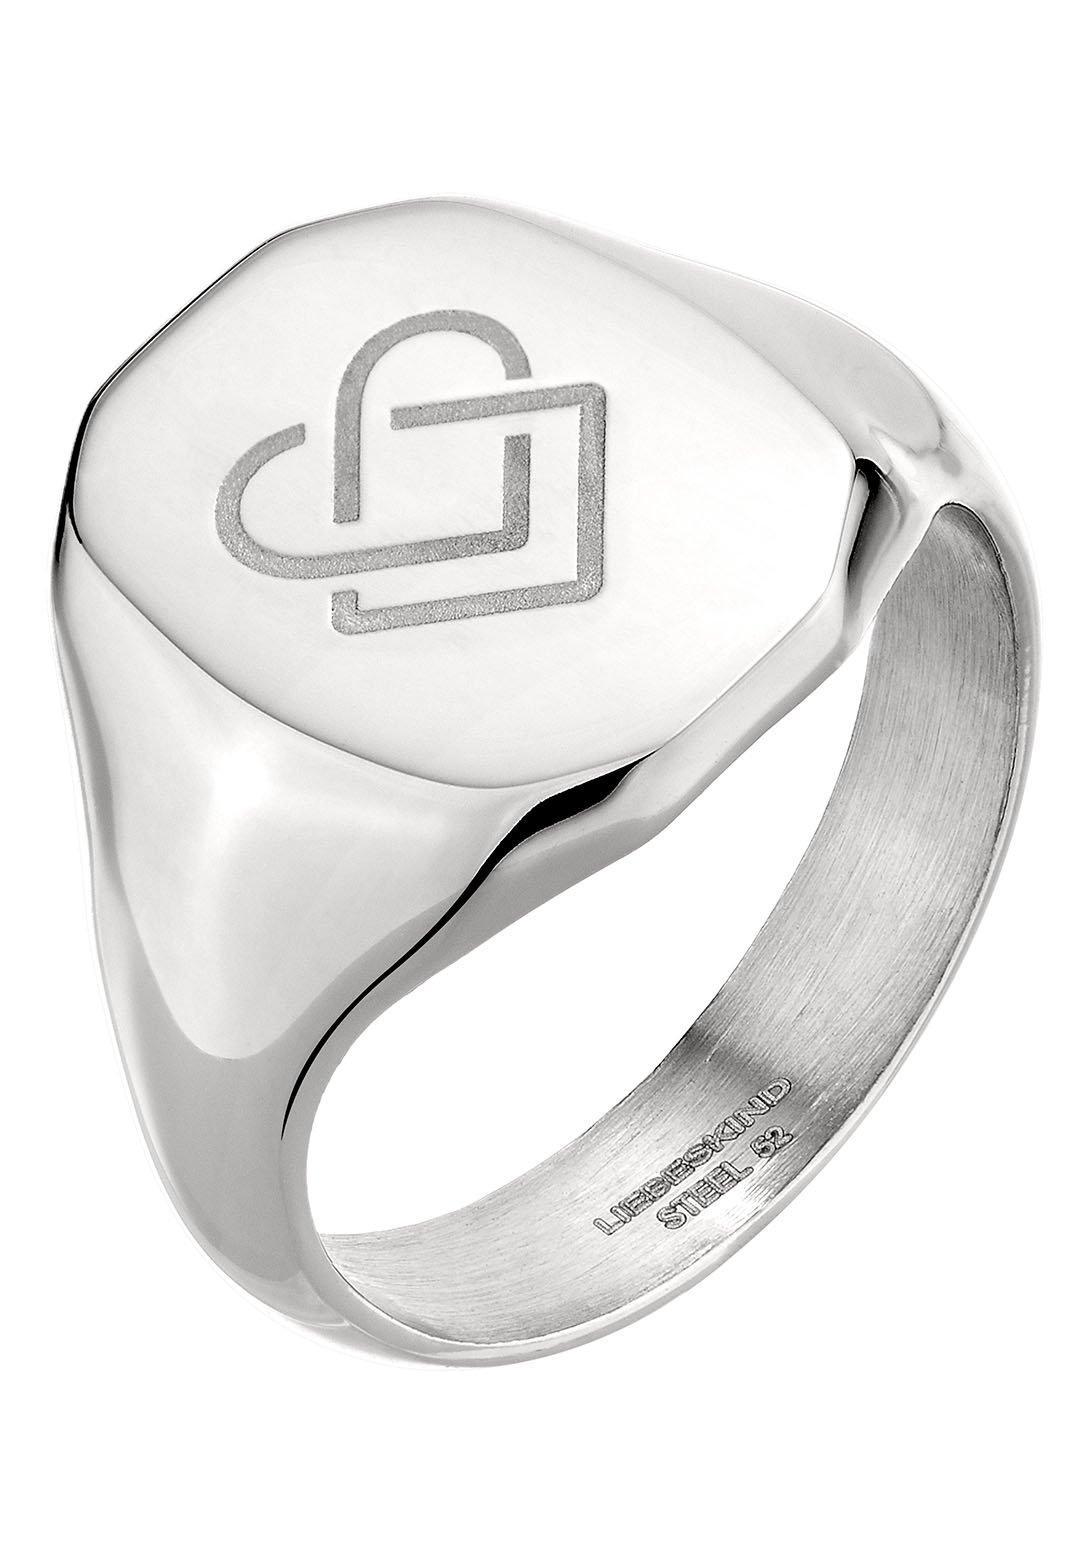 Liebeskind Berlin Ring , LJ-0710-R-52,54,56, LJ-0711-R-52,54,56 nu online bestellen